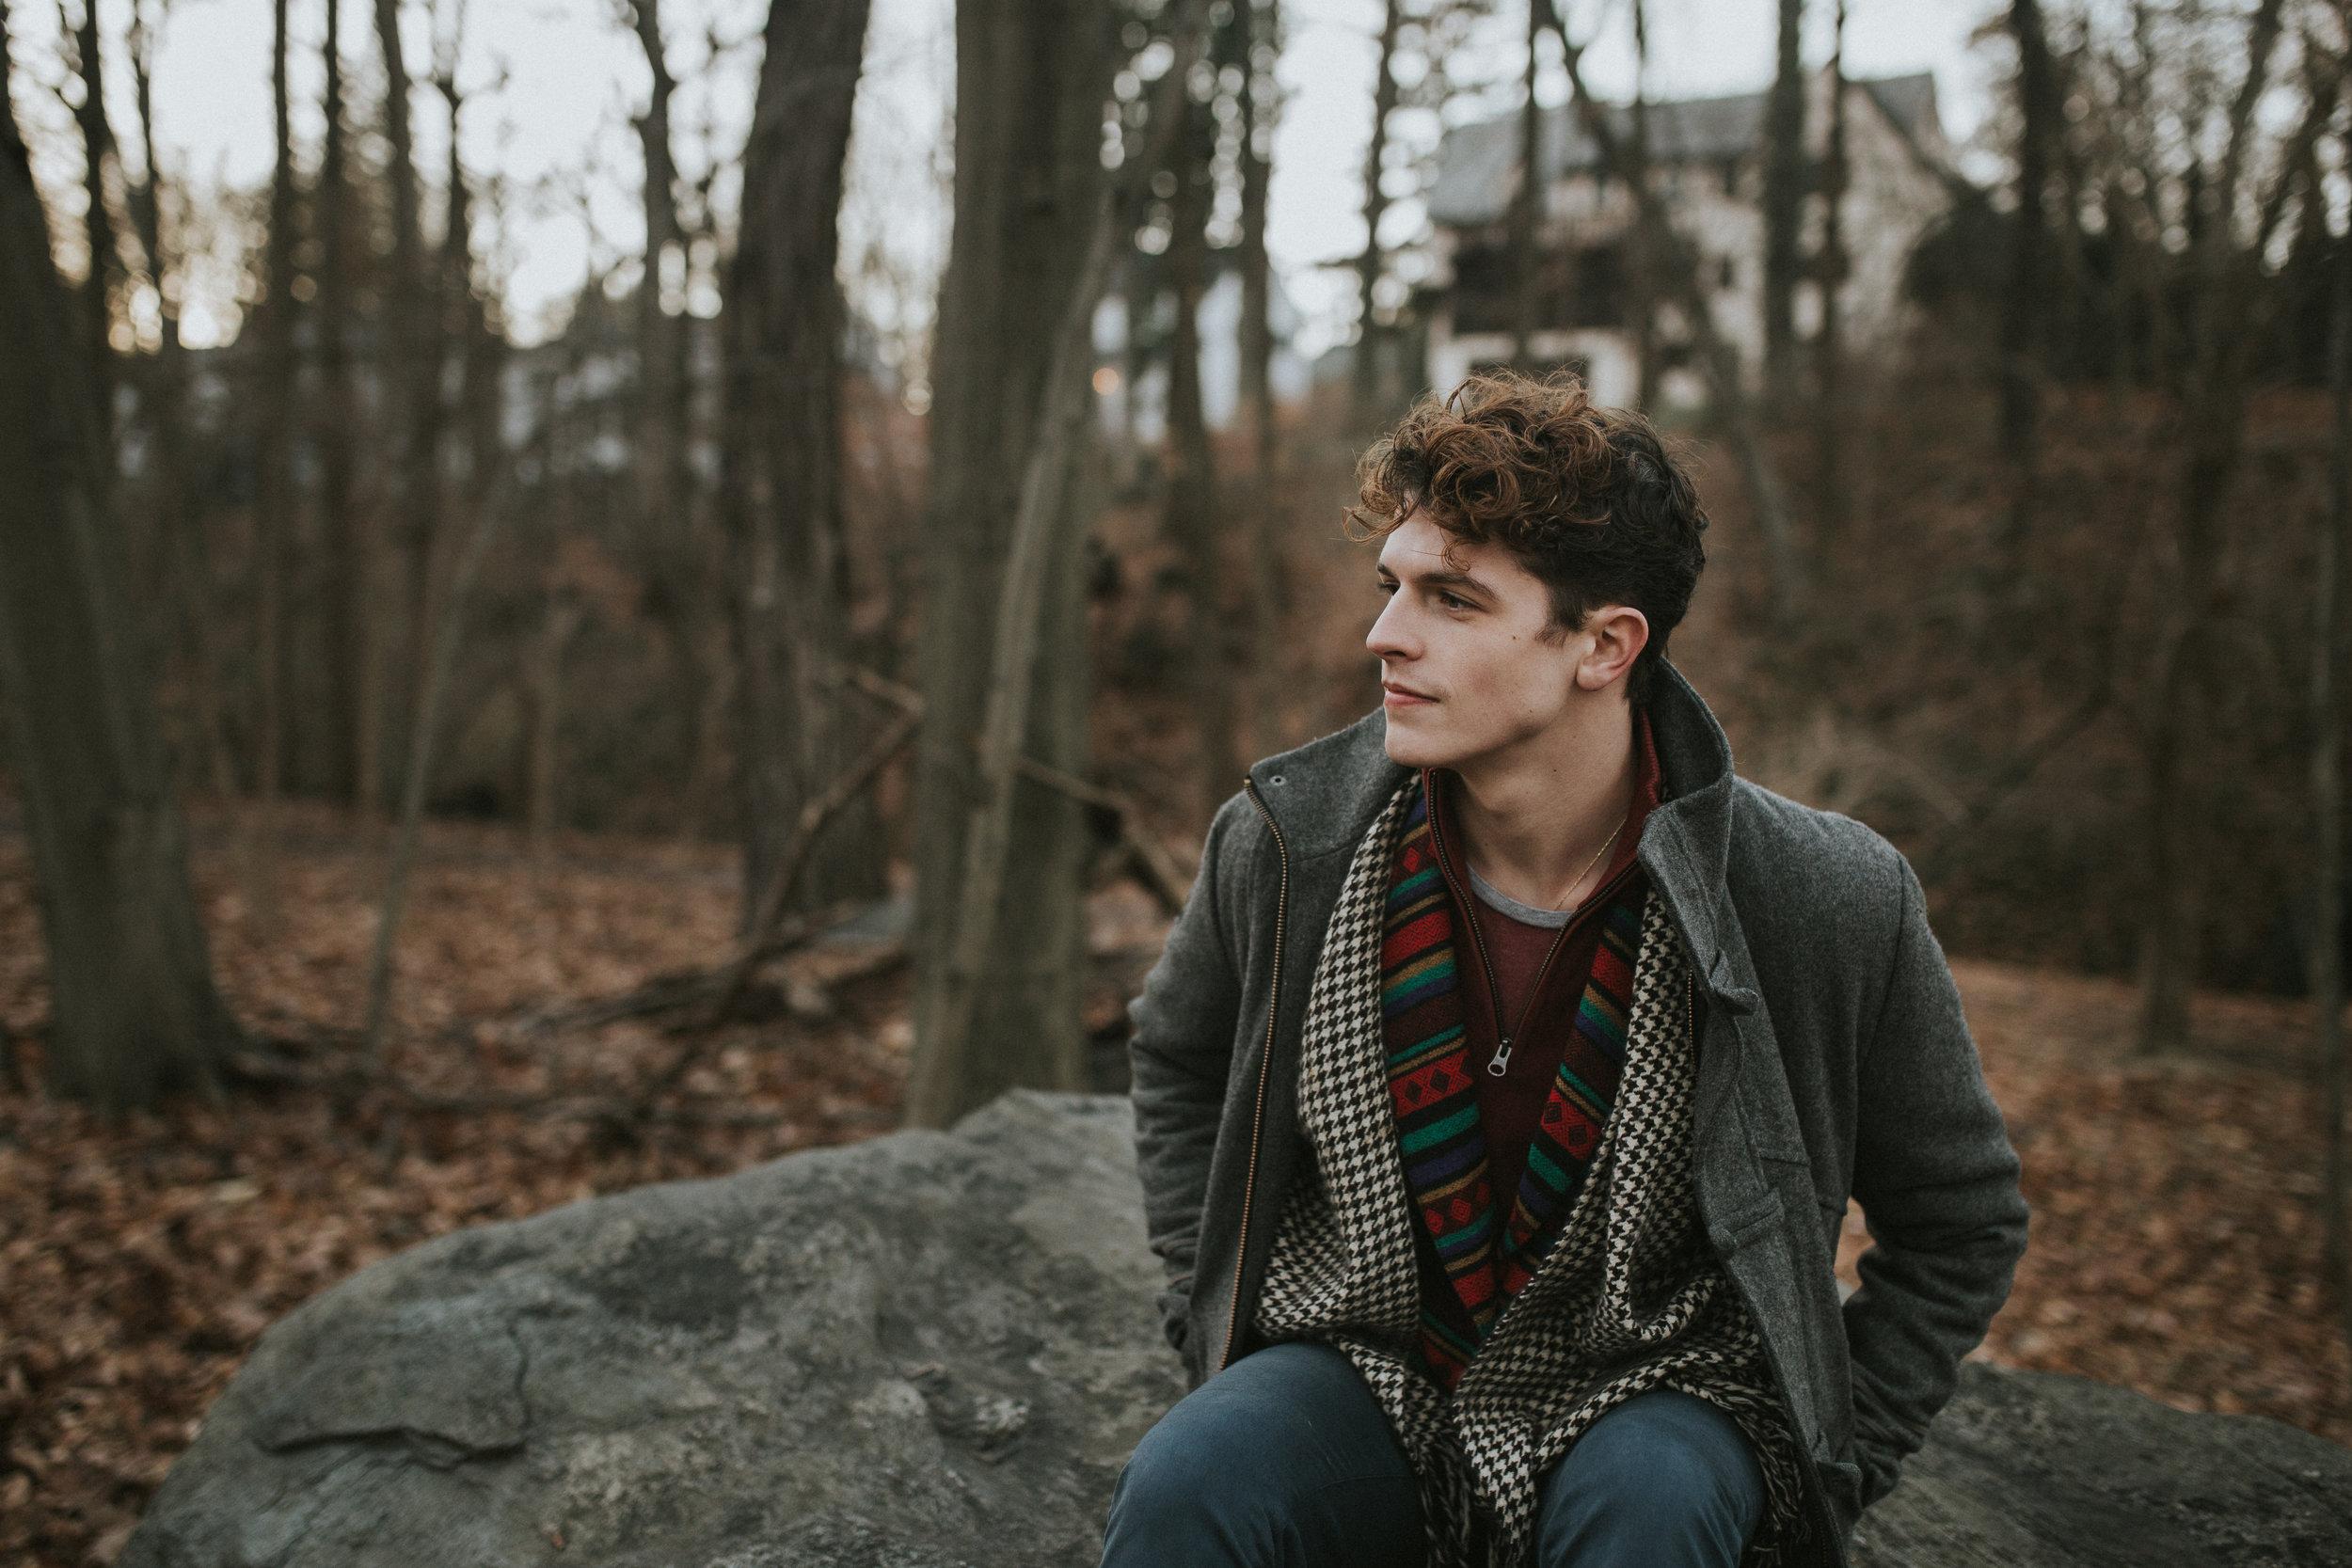 Brady Richards tumblr aesthetic gay model fall fashion urban outfitters New York lifestyle lookbook photographer free people woods photoshoot ukelele hipster male model-1.jpg